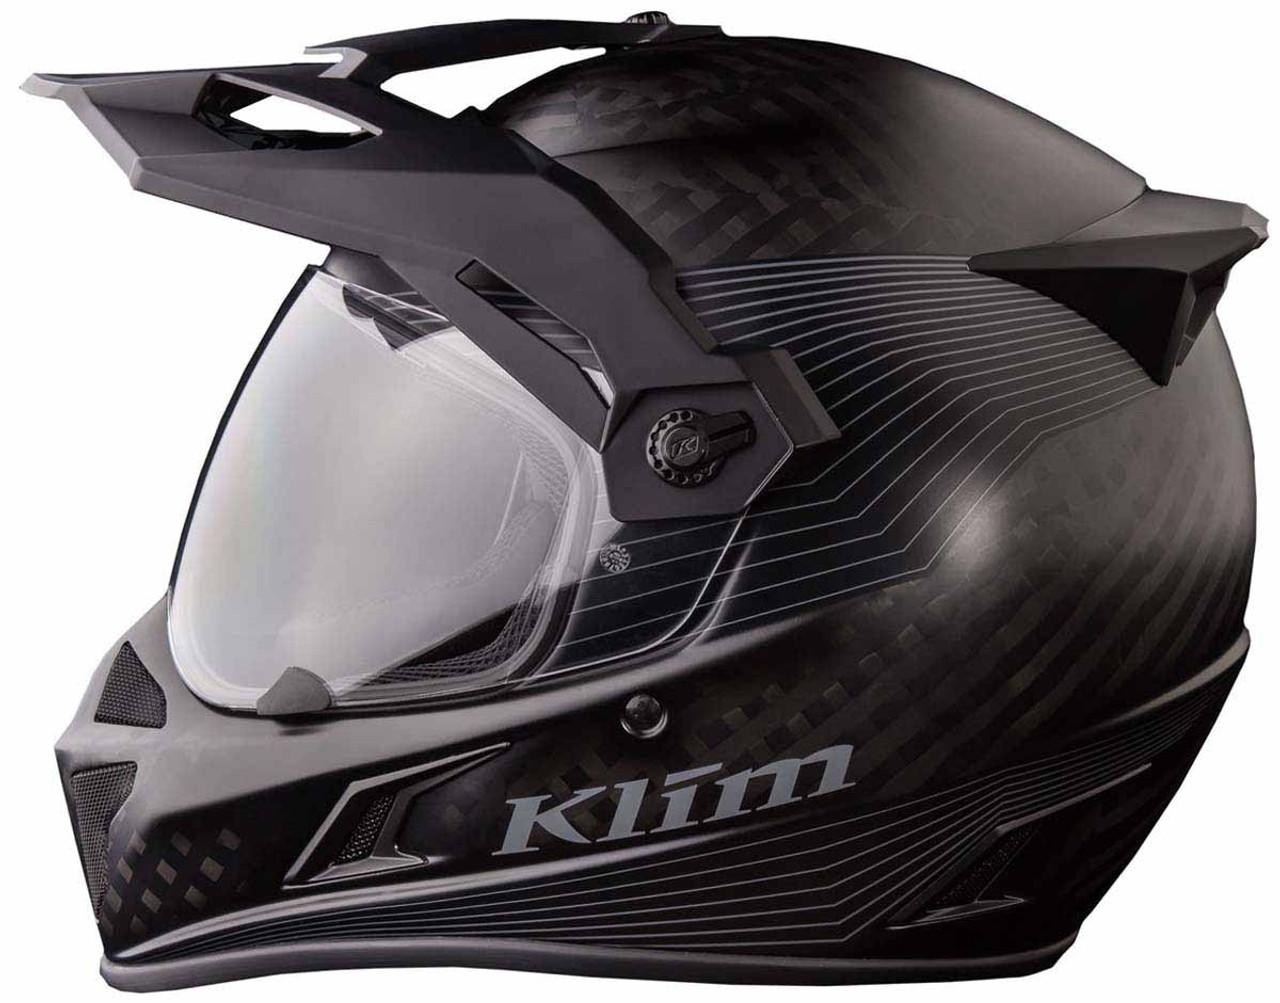 KLIM Krios Karbon Adventure Helmet with SENA Bluetooth Kit